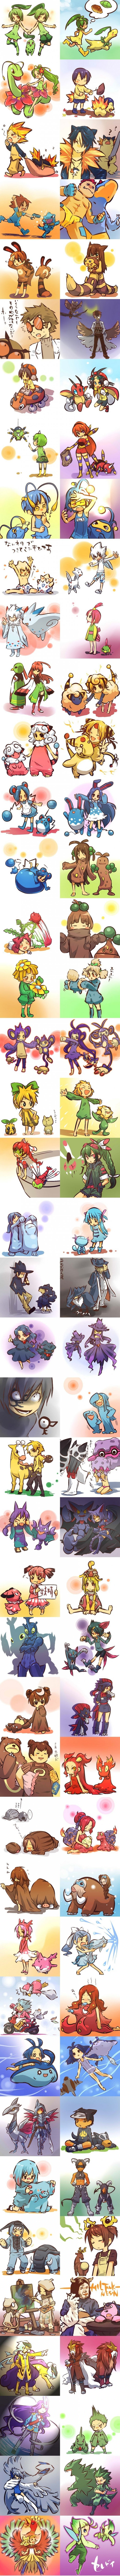 Image Pokémons Humains 3